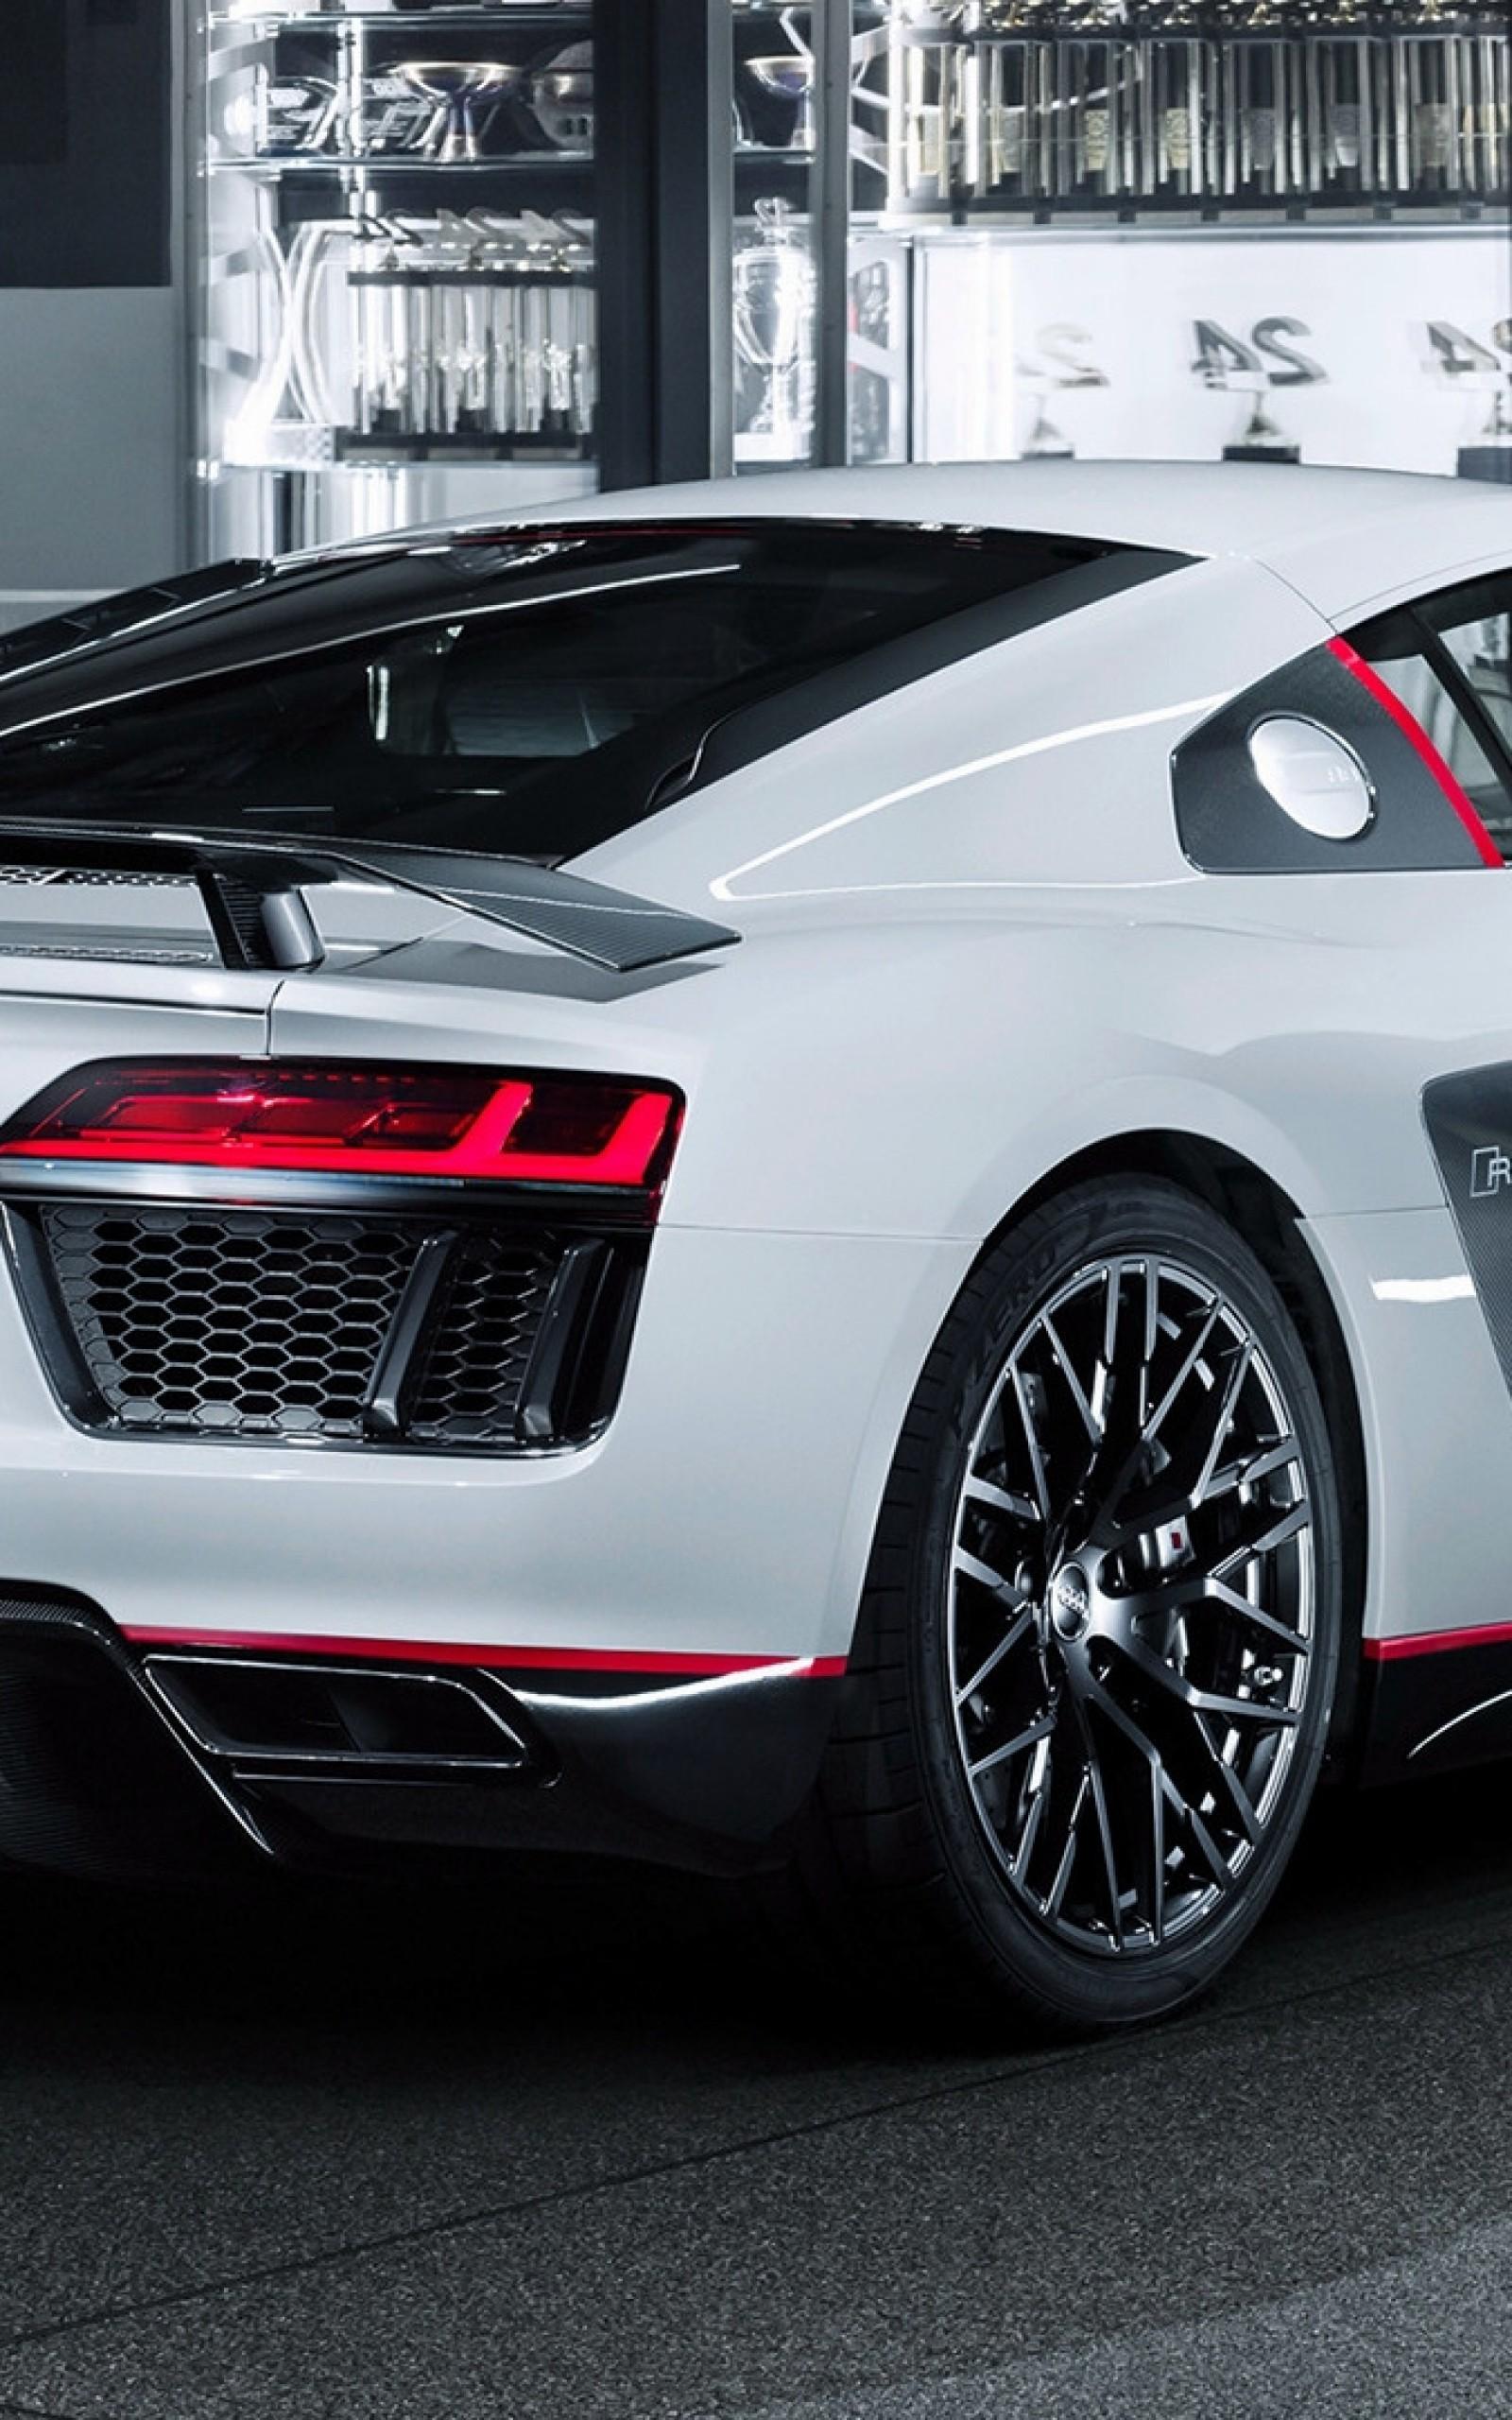 Audi R8 V10 Plus, White, Side View, Luxury, Cars - Audi R8 V10 Plus Hd , HD Wallpaper & Backgrounds